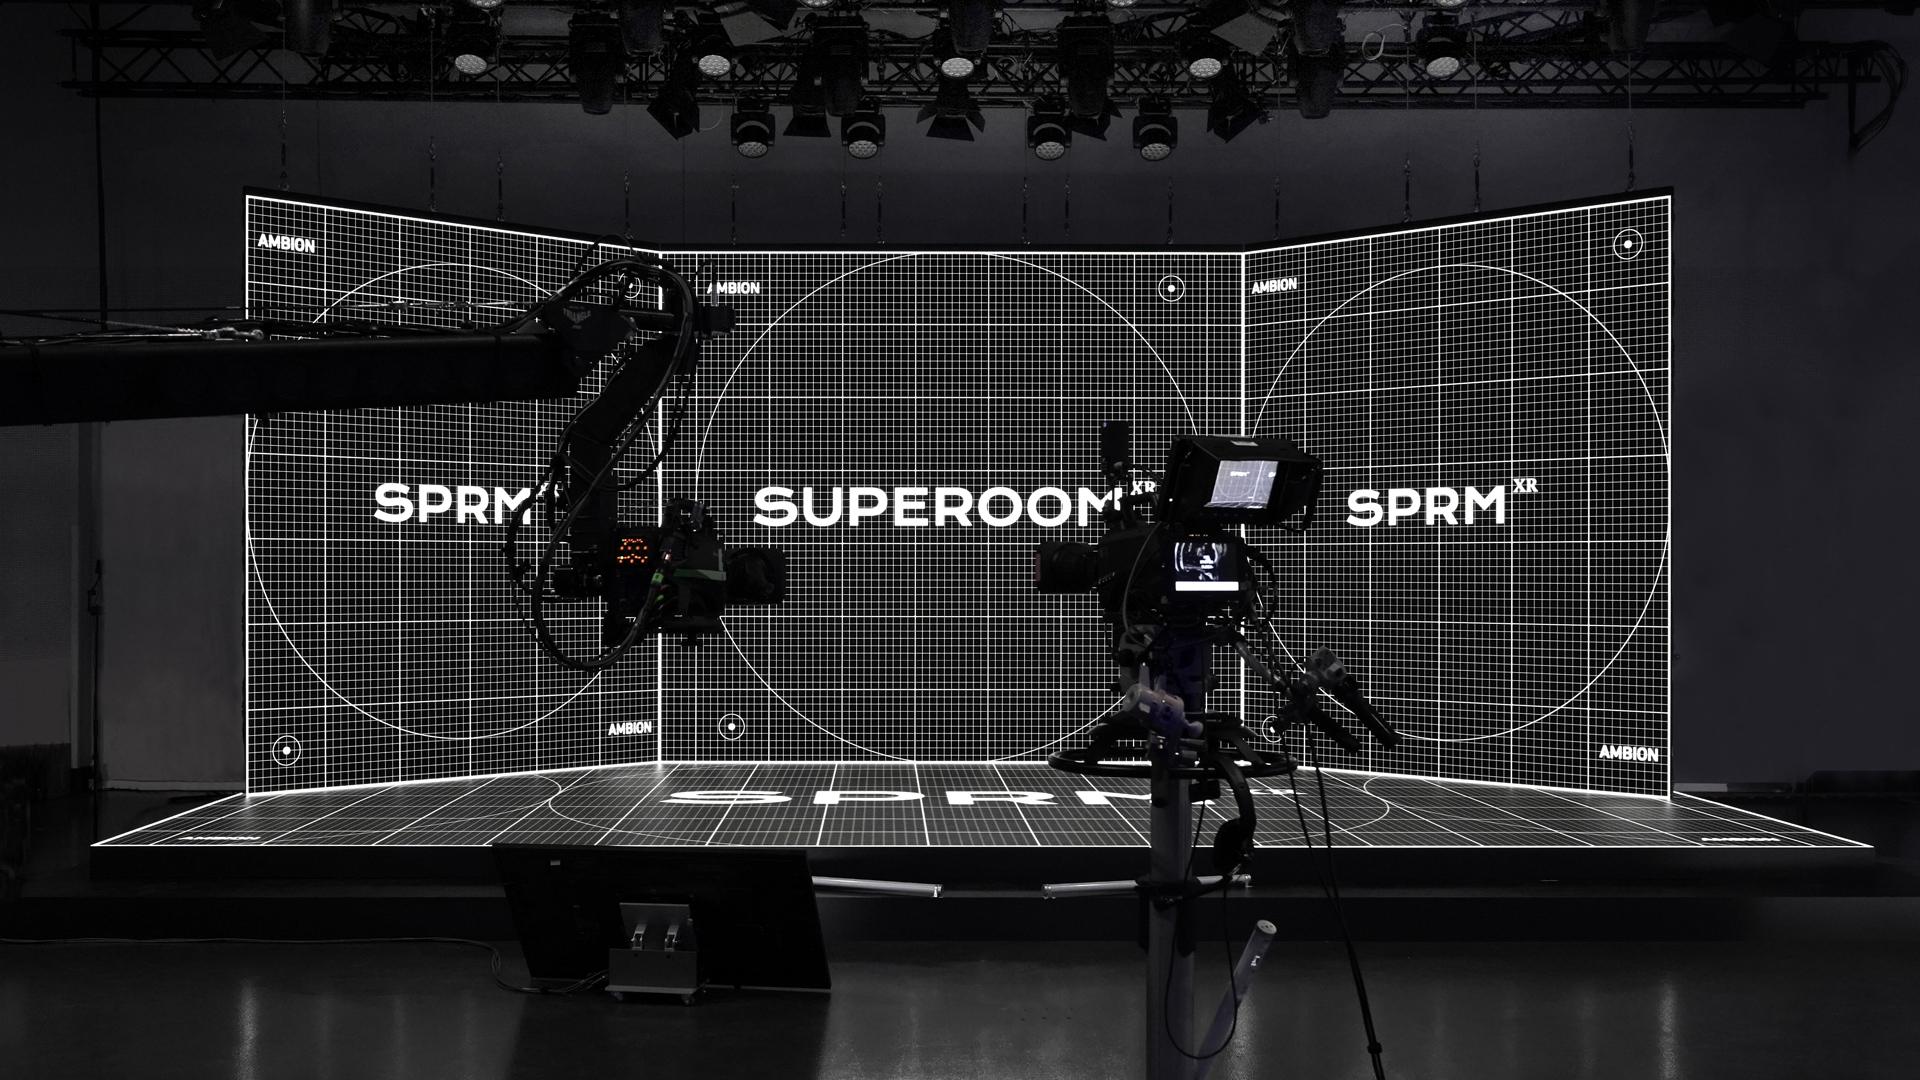 superoom_xr_berlin_ambion_01